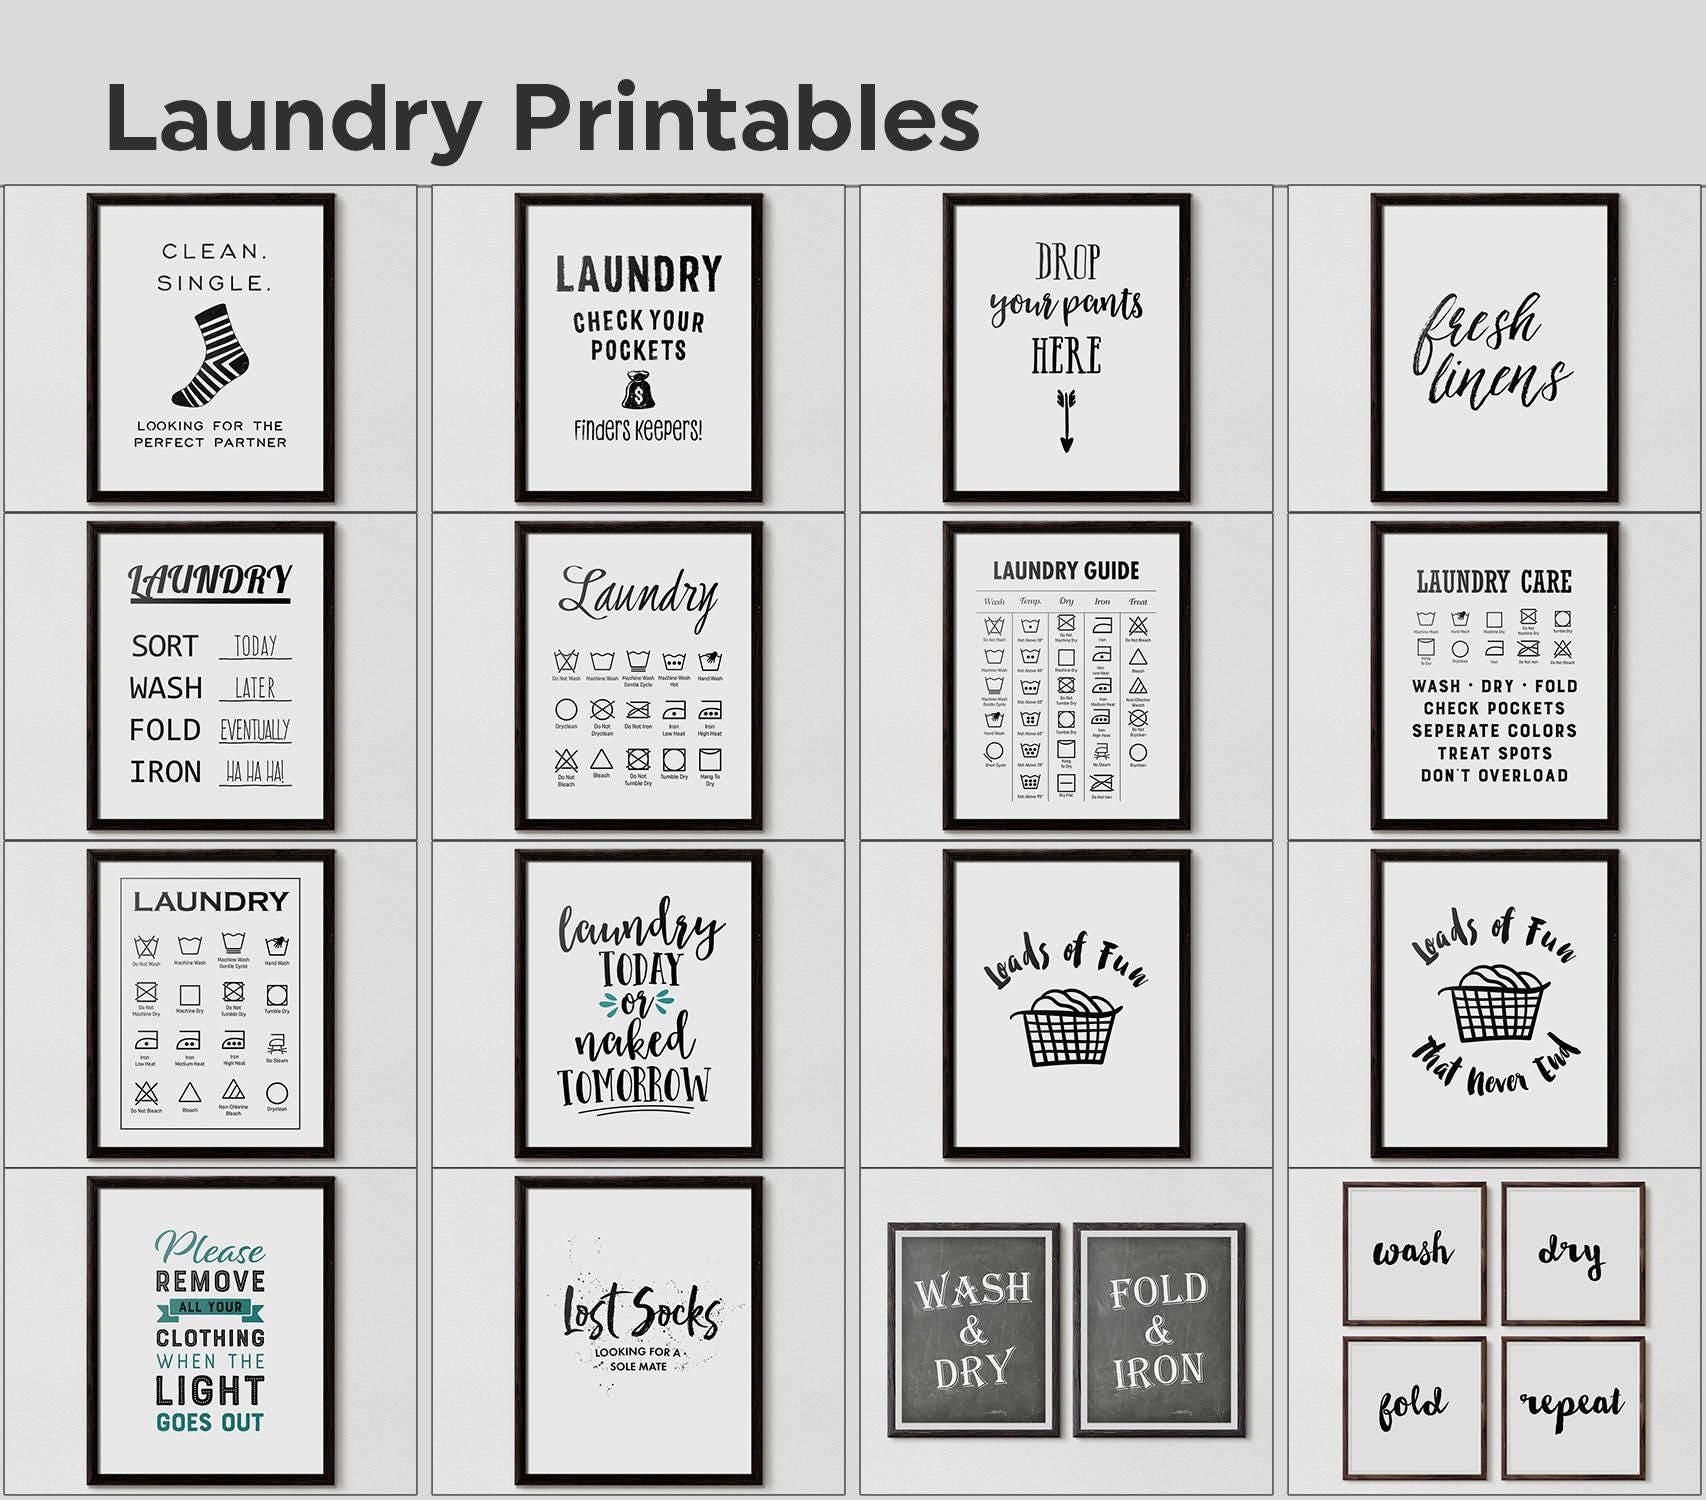 Laundry symbols laundry symbol chart laundry room ideas laundry gallery photo gallery photo gallery photo gallery photo biocorpaavc Gallery